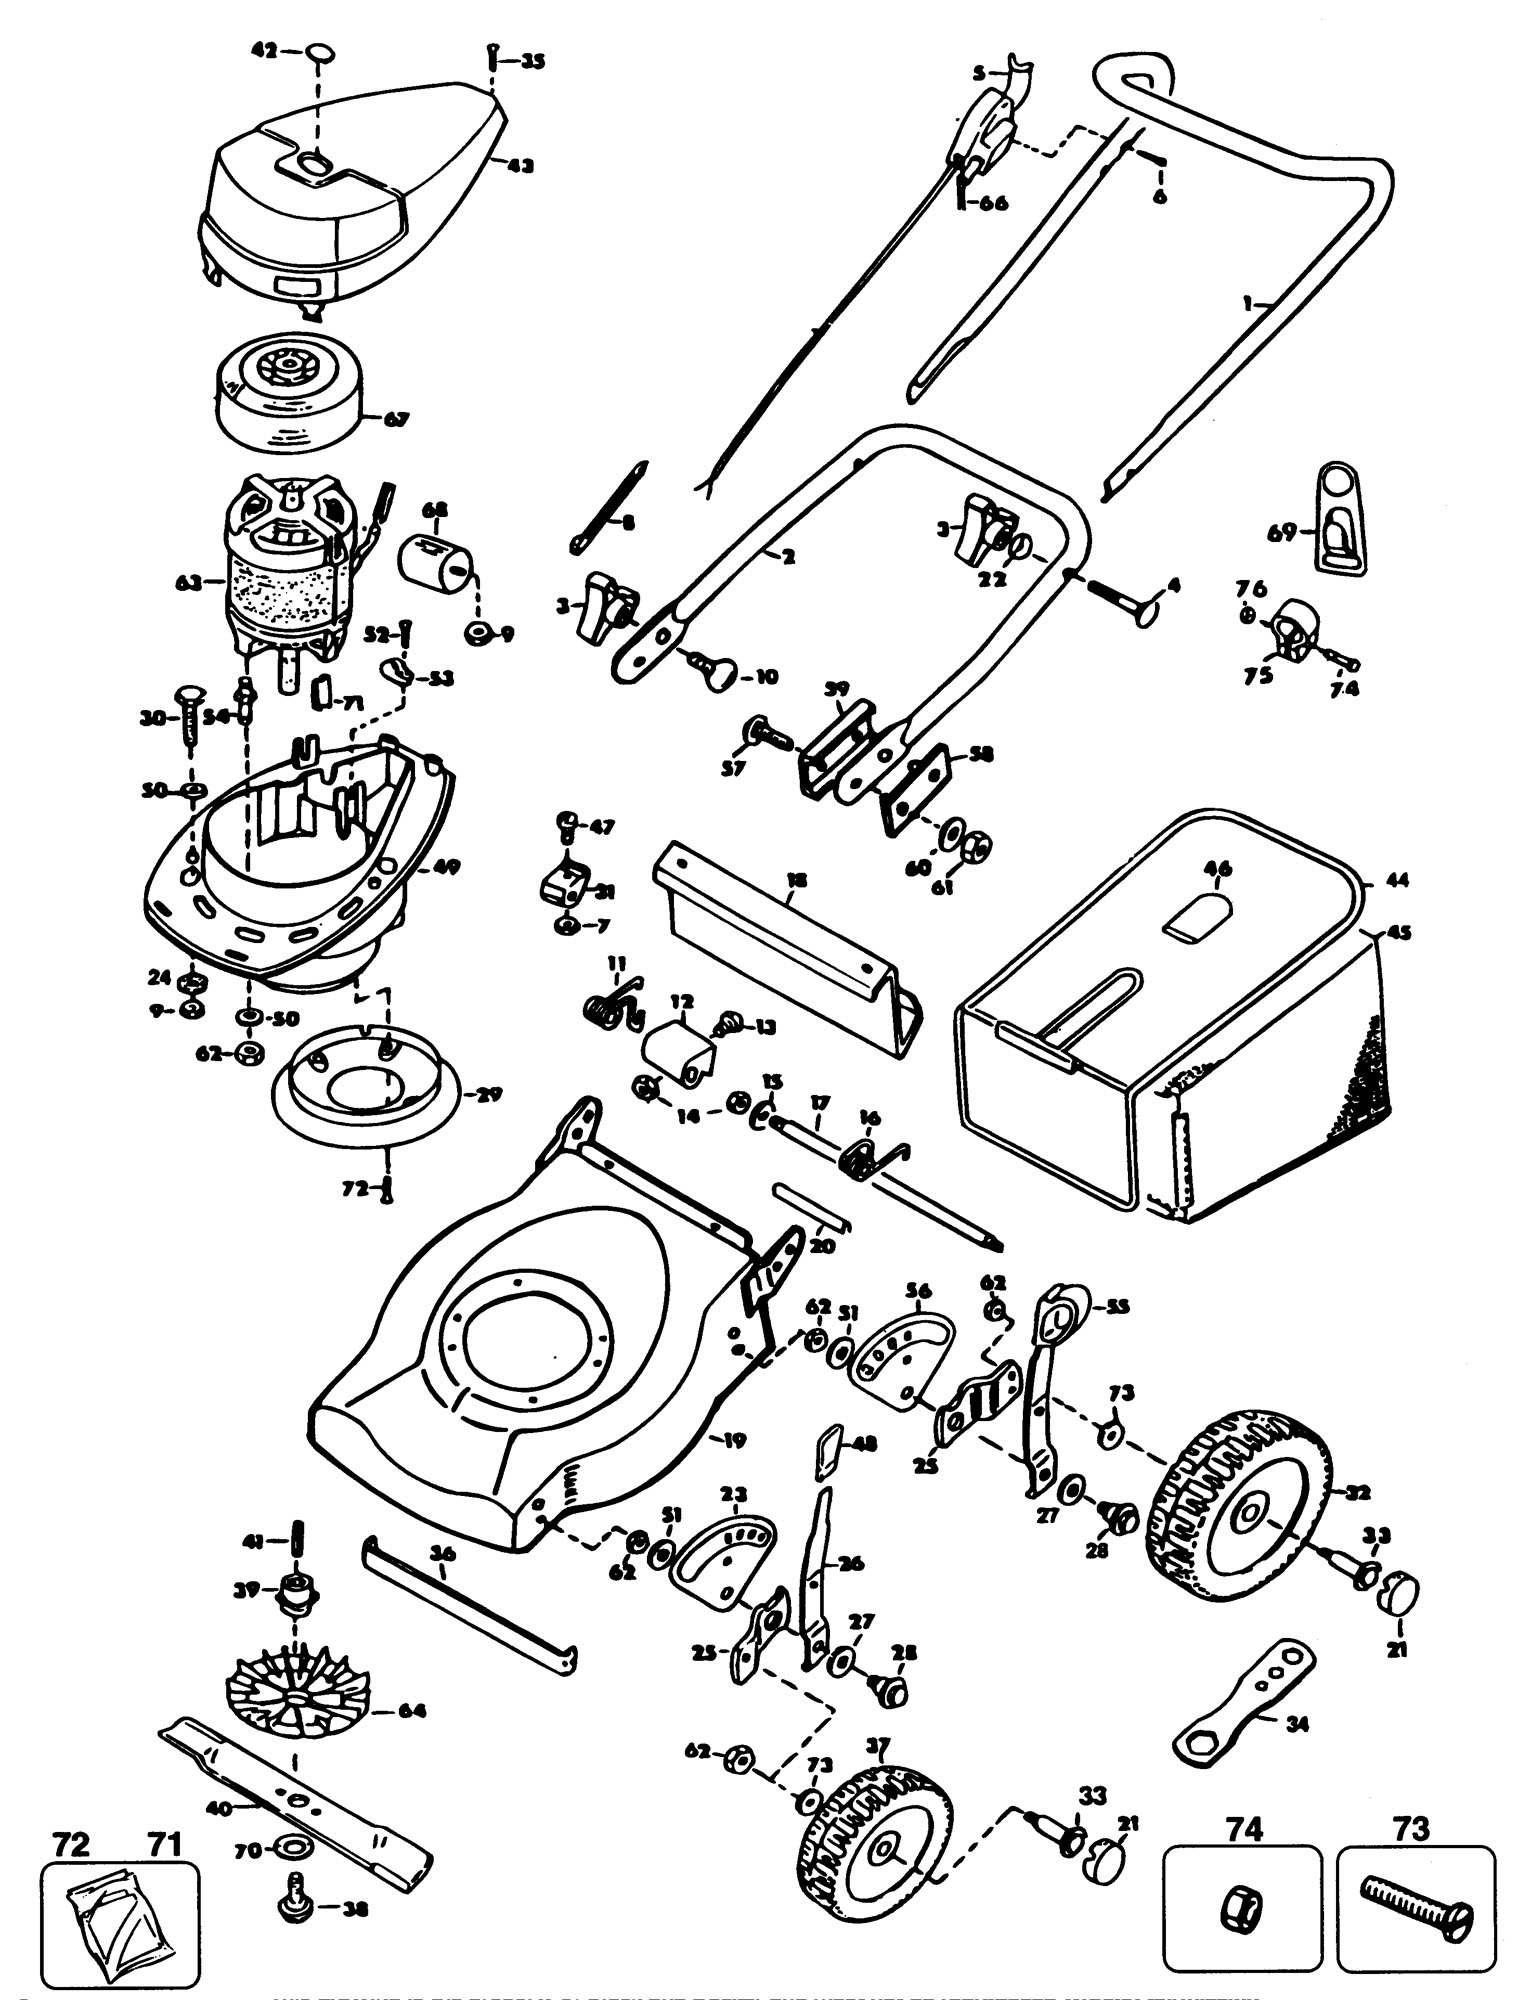 Spares for Black & Decker Gr530 Rotary Mower (type 2